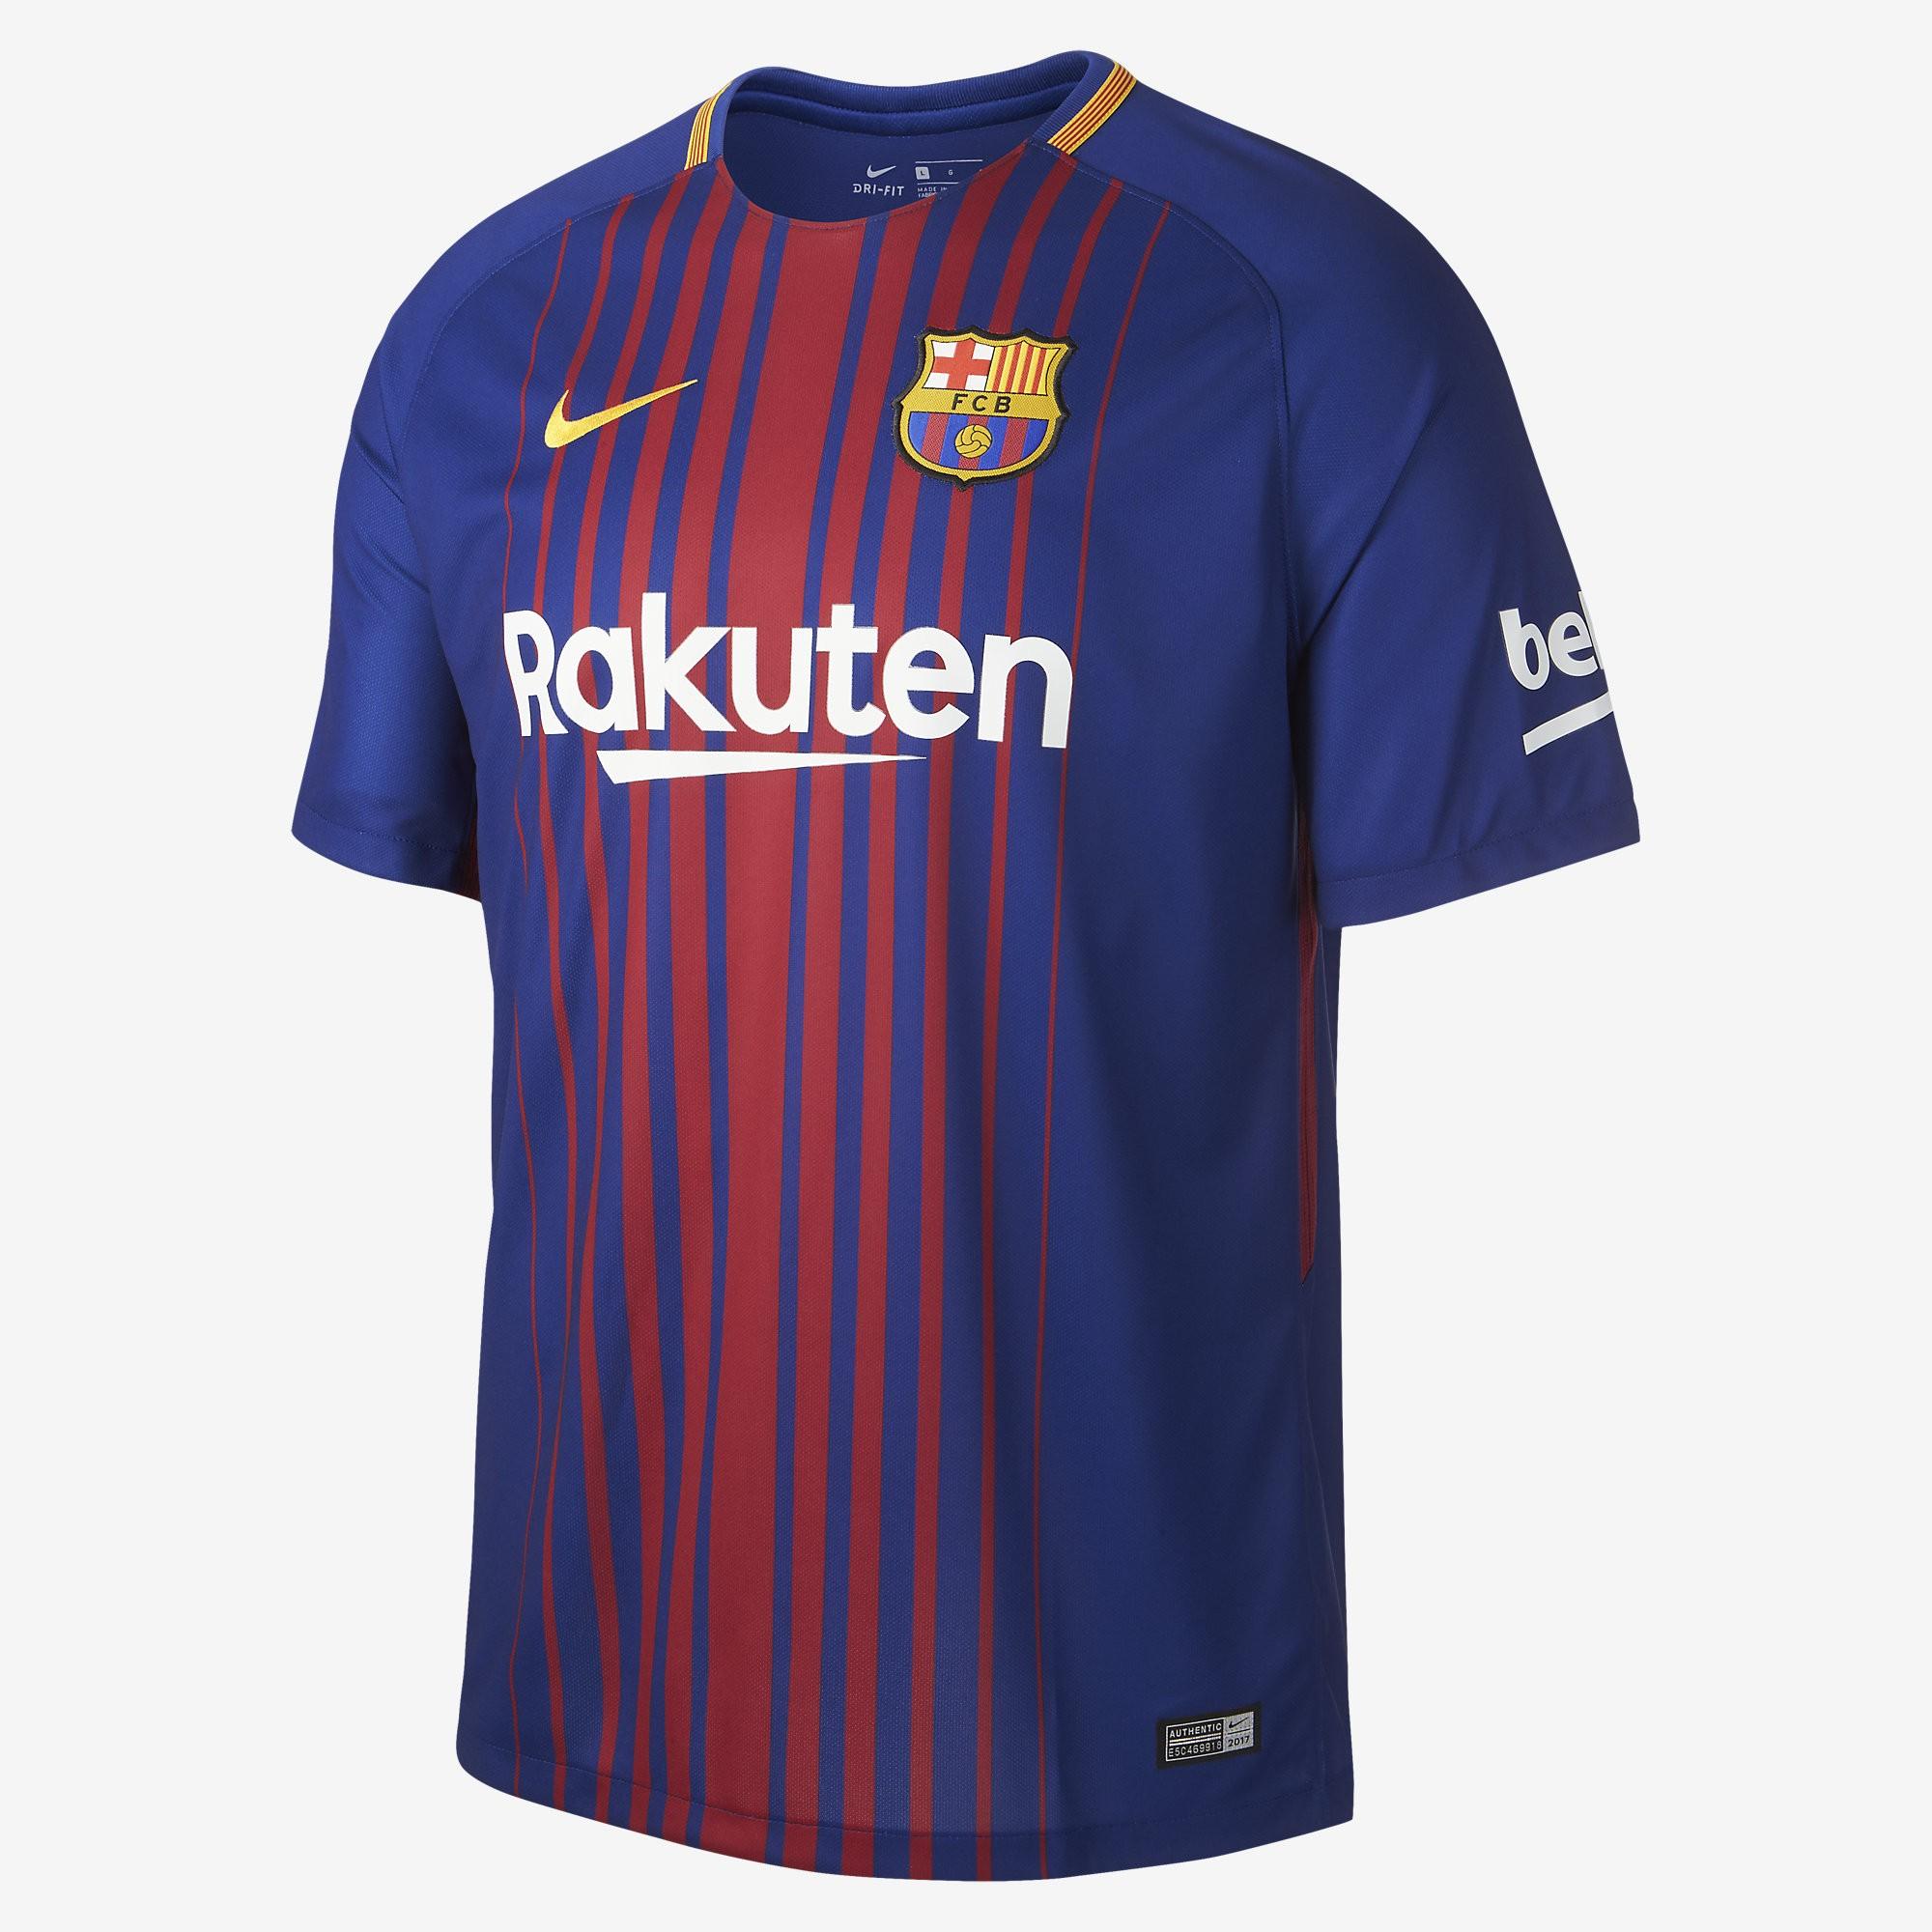 Camiseta Nike FC Barcelona 17-18 Stadium Home 847255 456 - Deportes  Manzanedo 9d3b105955f